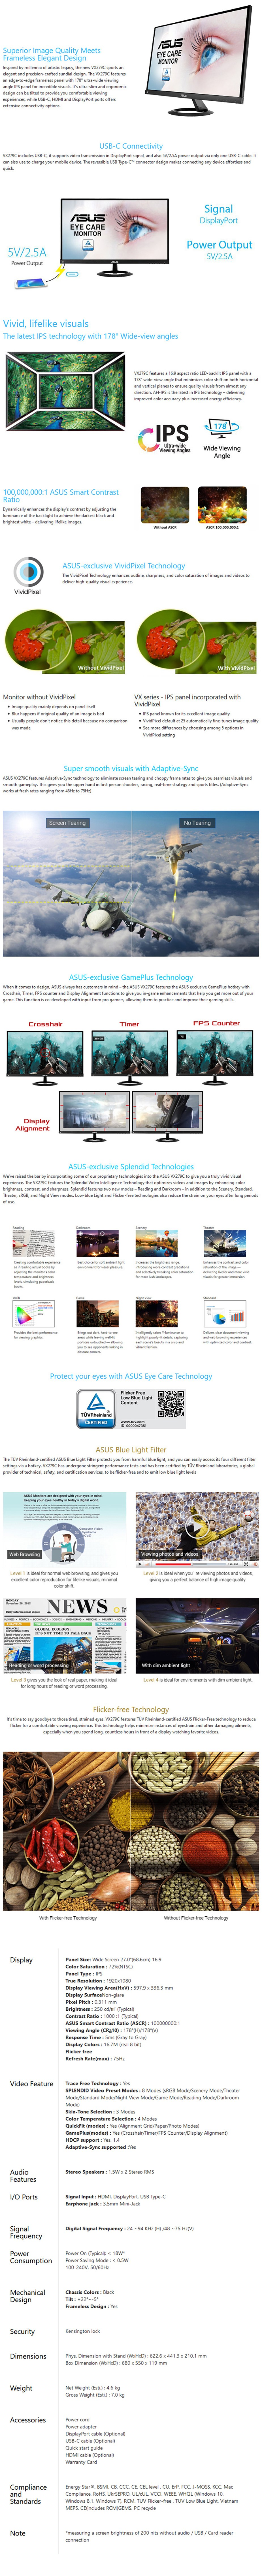 asus-vx279c-27-75hz-full-hd-aadaptive-sync-usbc-eye-care-ips-monitor-ac35829-8.jpg